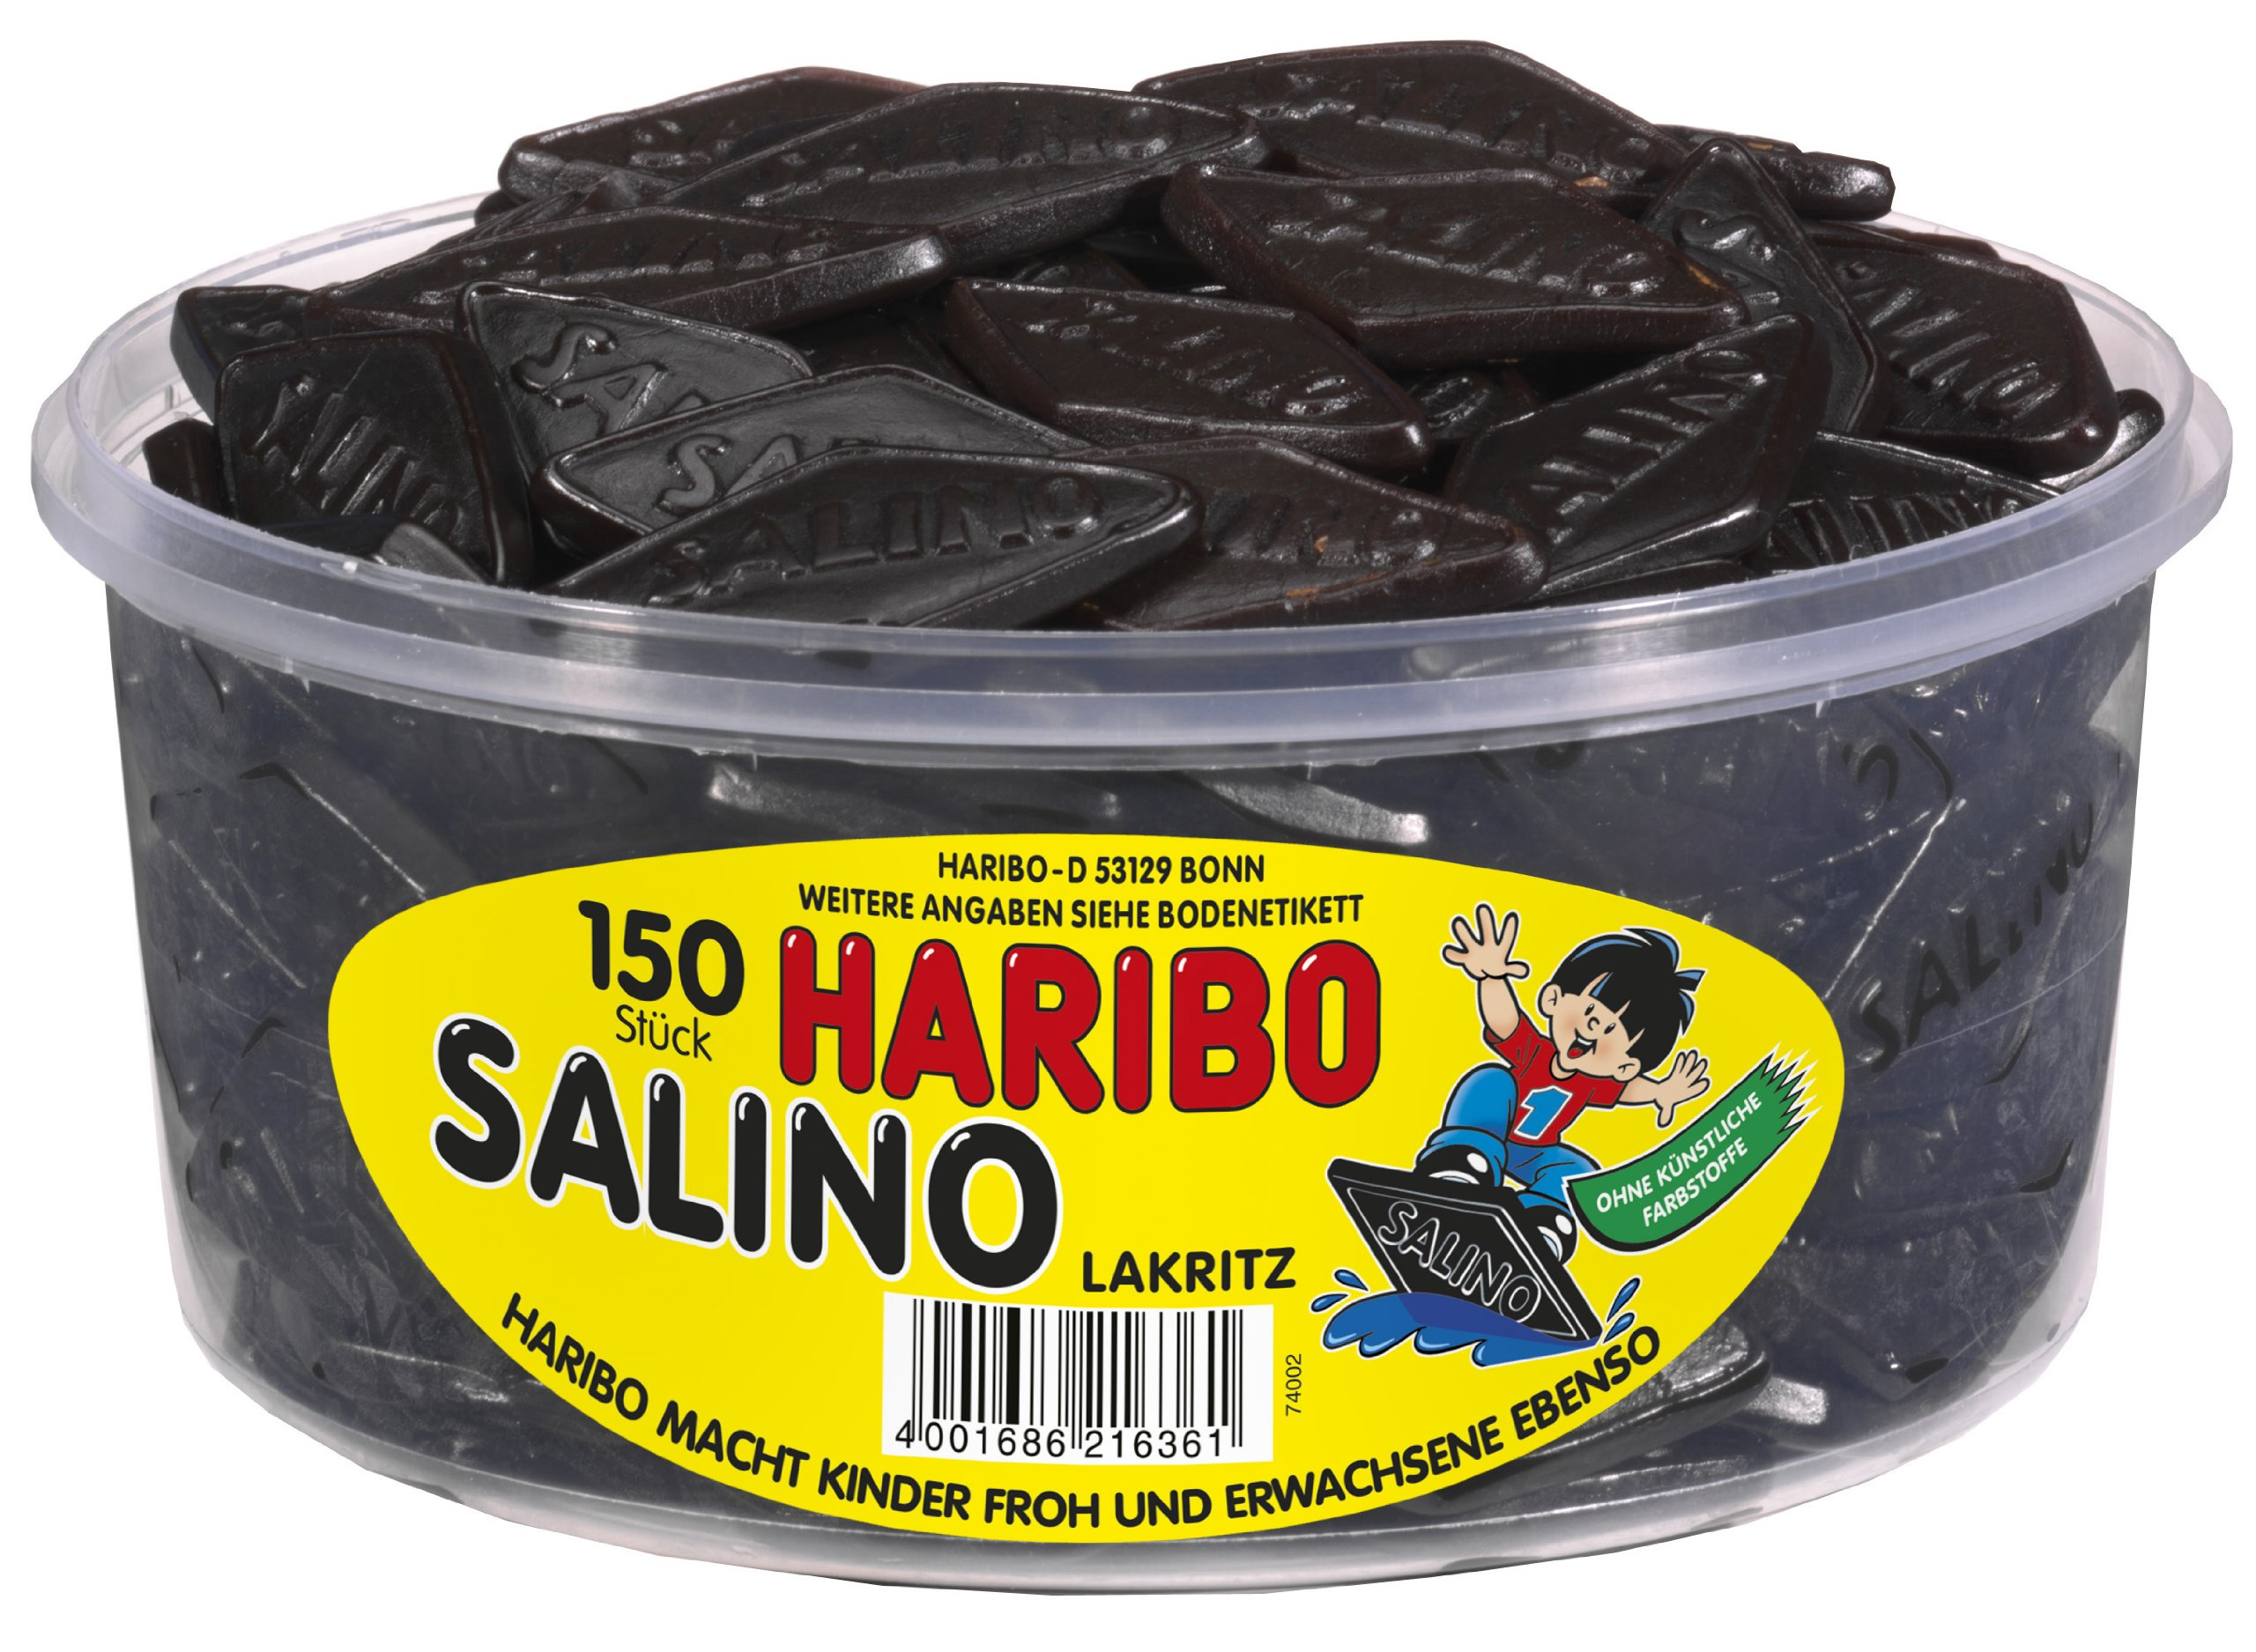 Haribo Salino 1.2 Kg - 150 Pieces - Licorice Lakritz Box - 42 Oz. Or 2.6lbs by Haribo